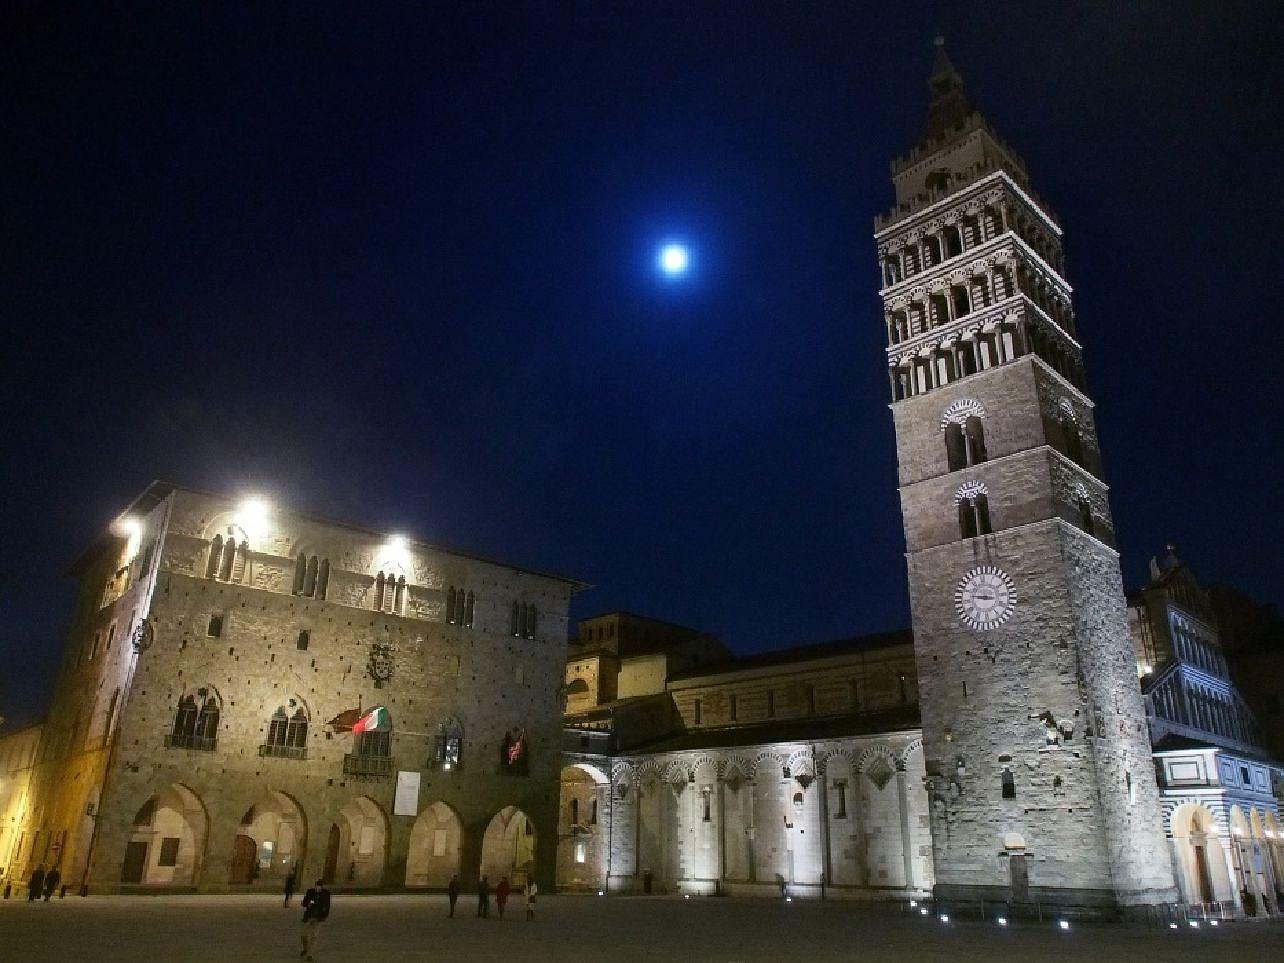 Pistoia i regionen Toscana i Italien